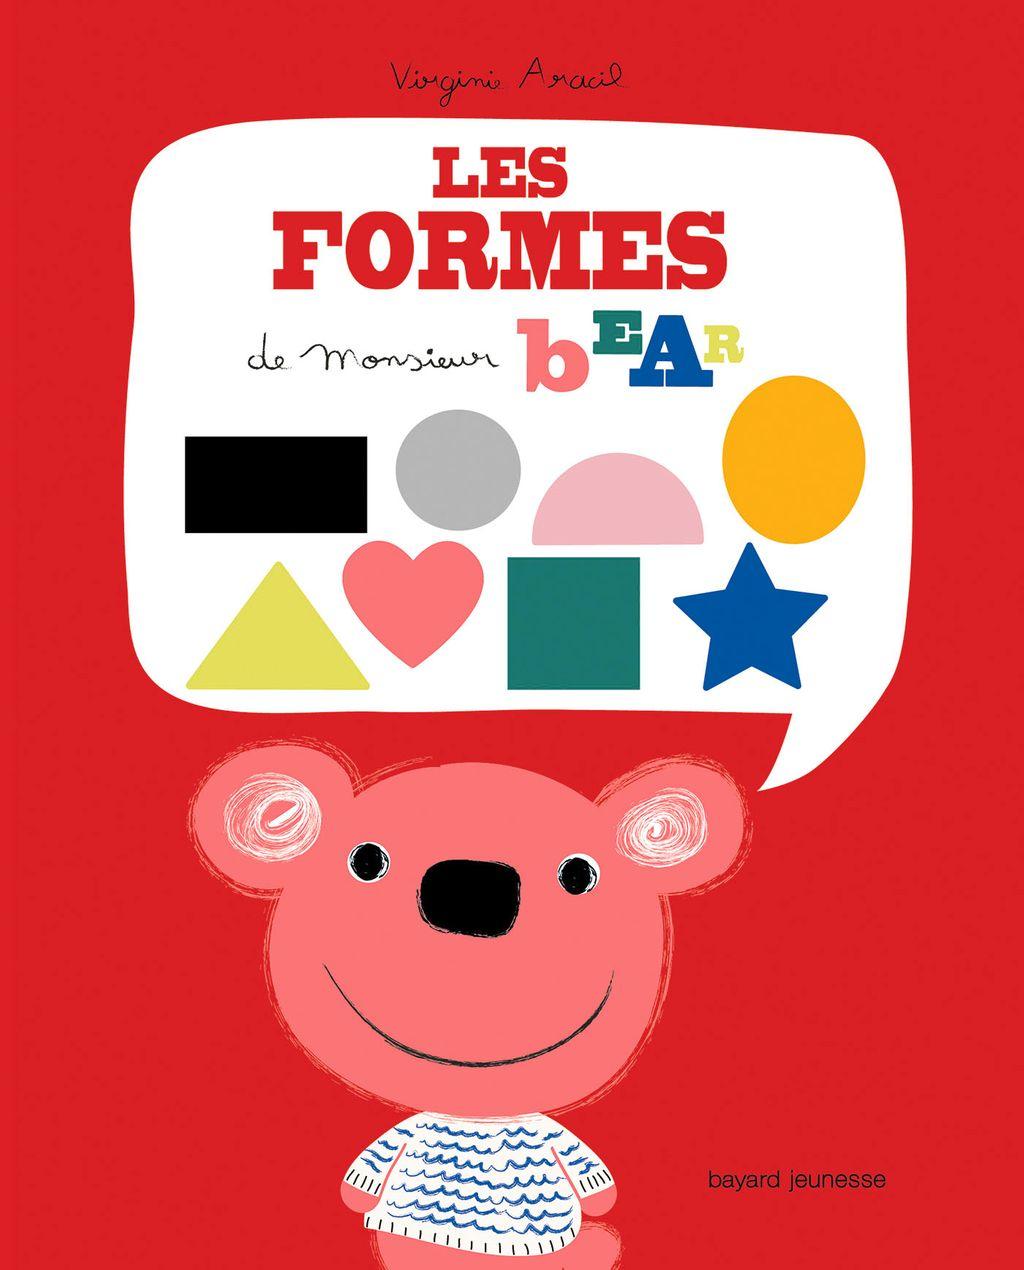 «M. Bear Les formes» cover